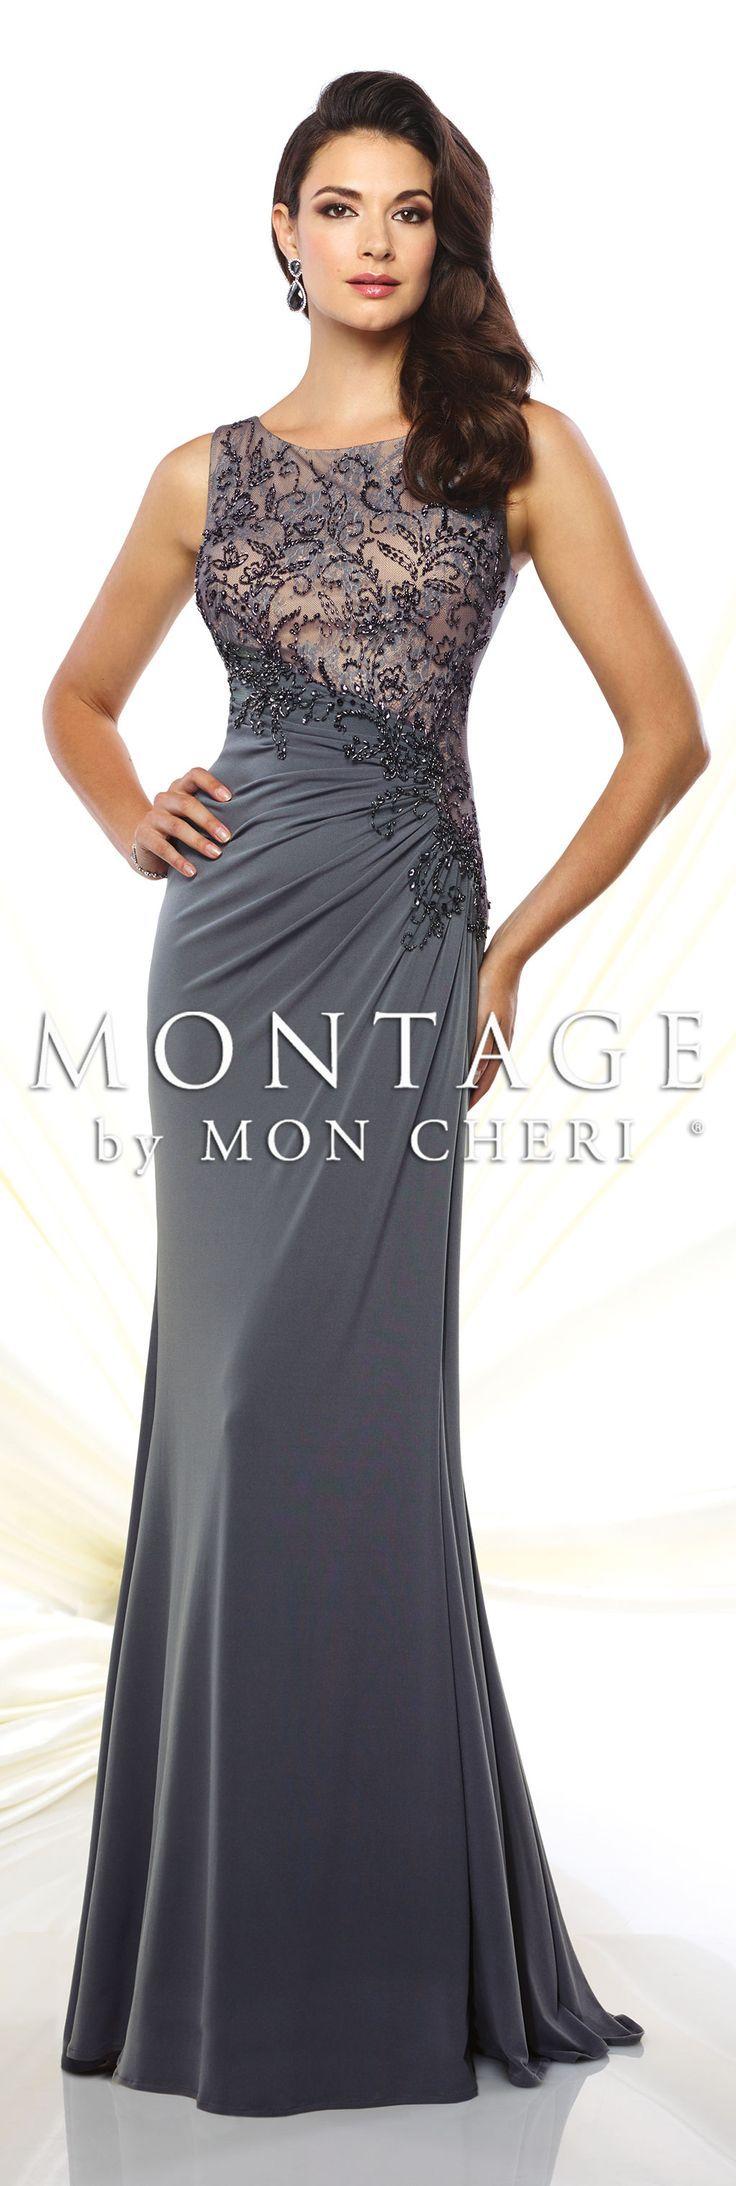 Mon Cheri Mother of the Bride Short Dresses